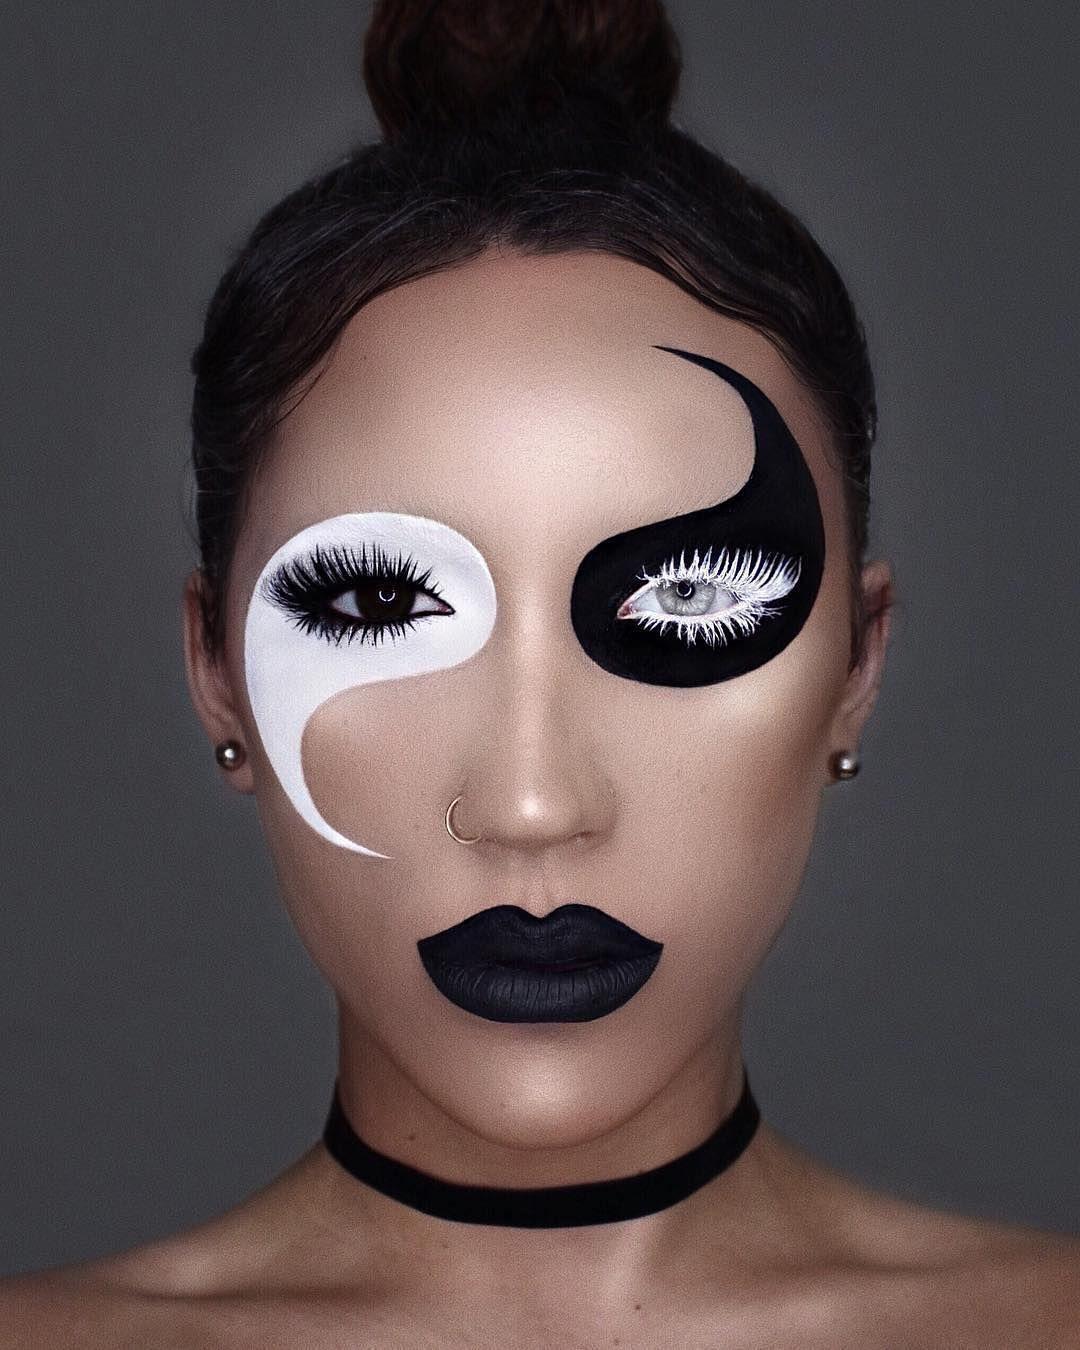 makeup sfx artistic cosplay crazy makeups amazing by